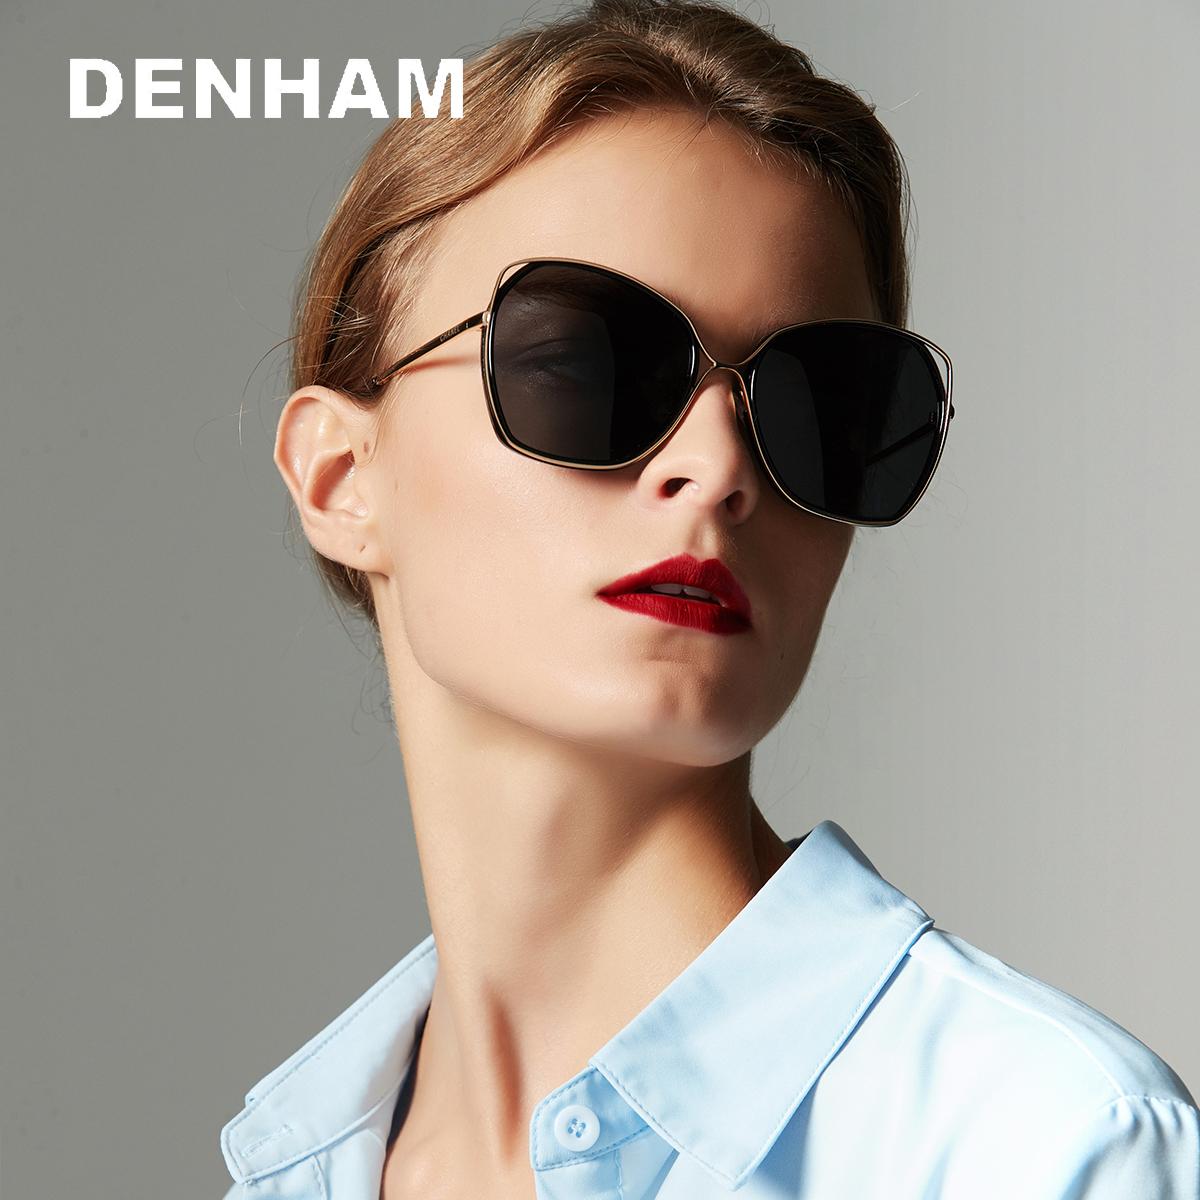 DENHAM时尚偏光可配近视太阳镜女士大框眼镜超轻墨镜防紫外线开车